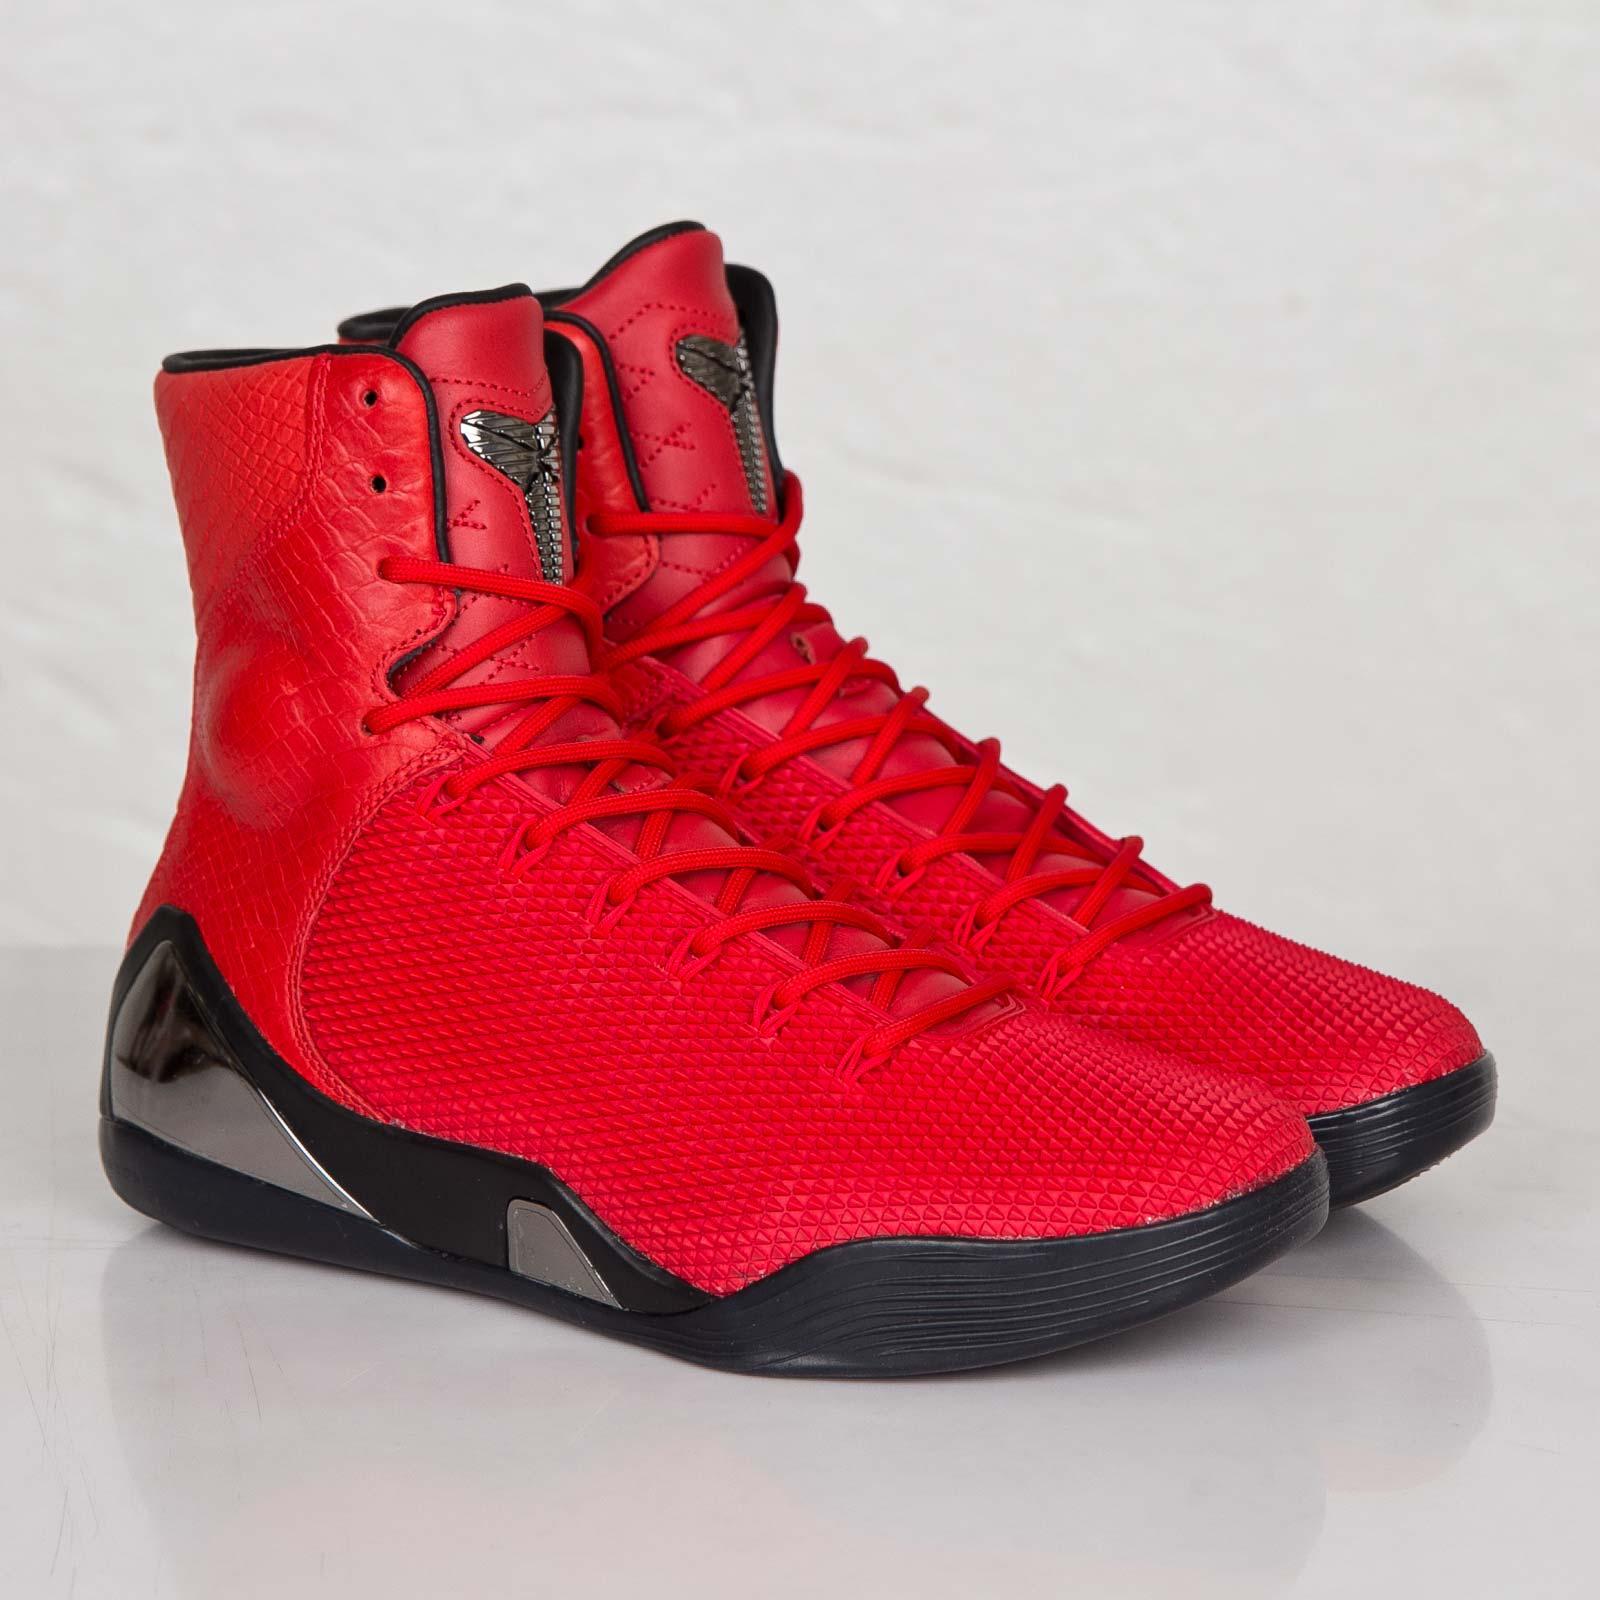 056f1511aeb94 Nike Kobe IX HI KRM EXT QS - 716993-600 - Sneakersnstuff | sneakers ...